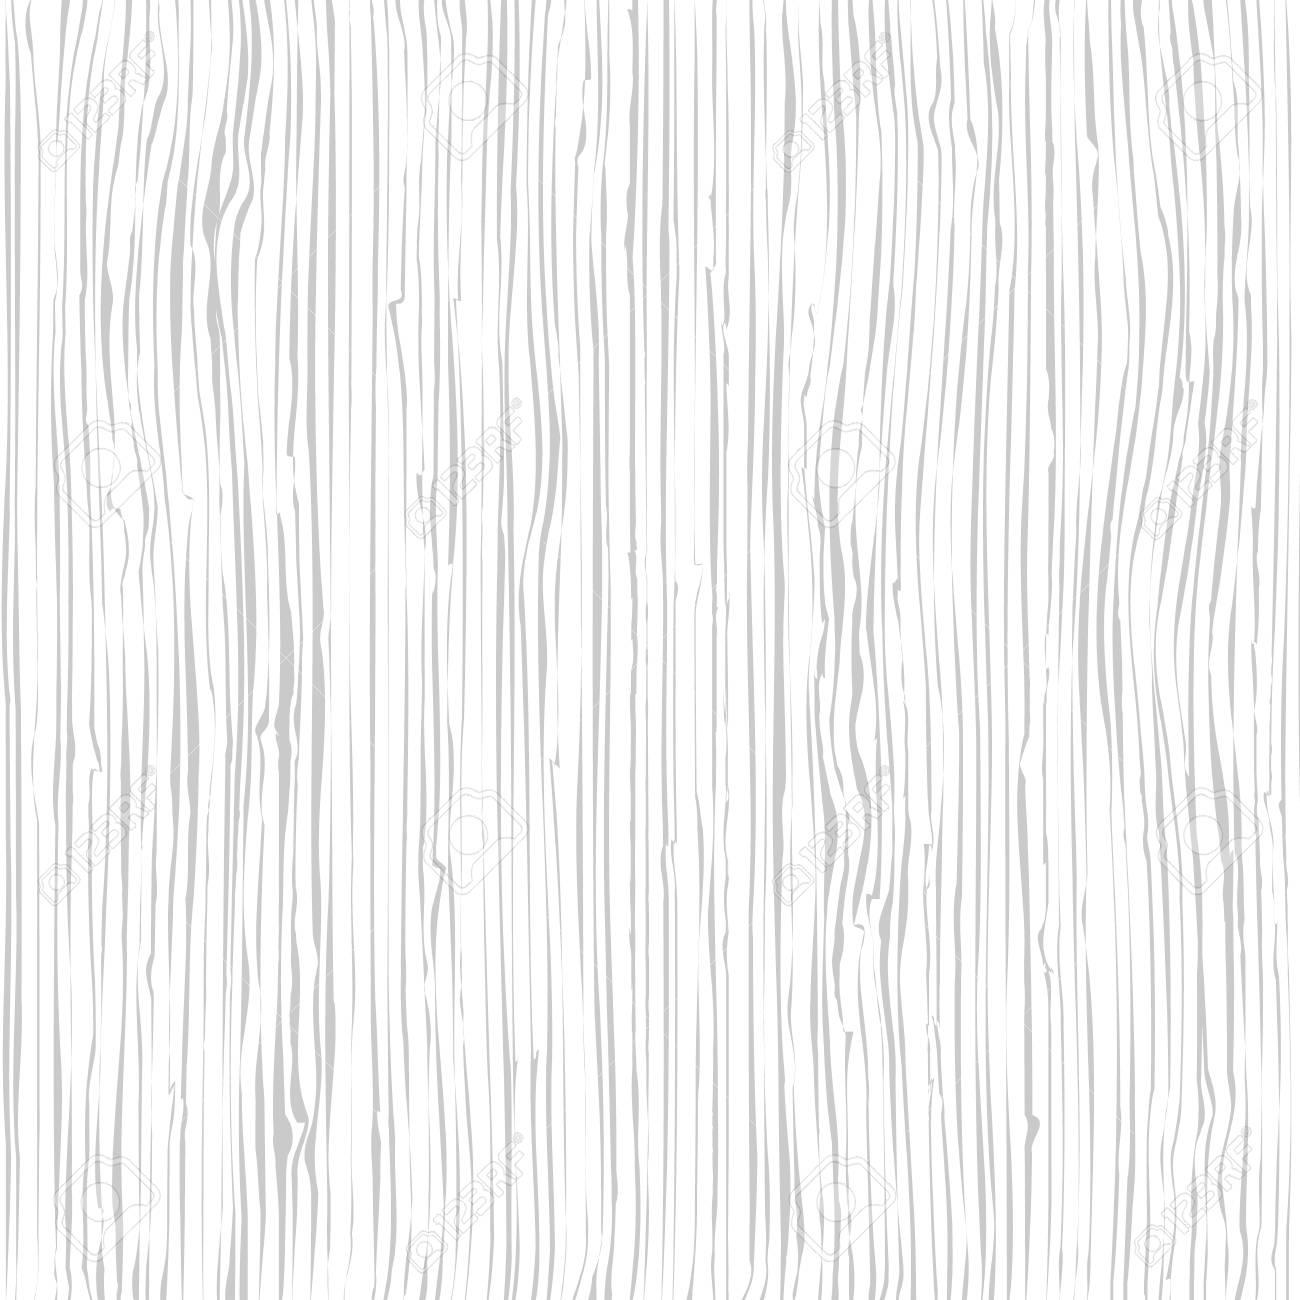 Wood grain pattern design - 100063451